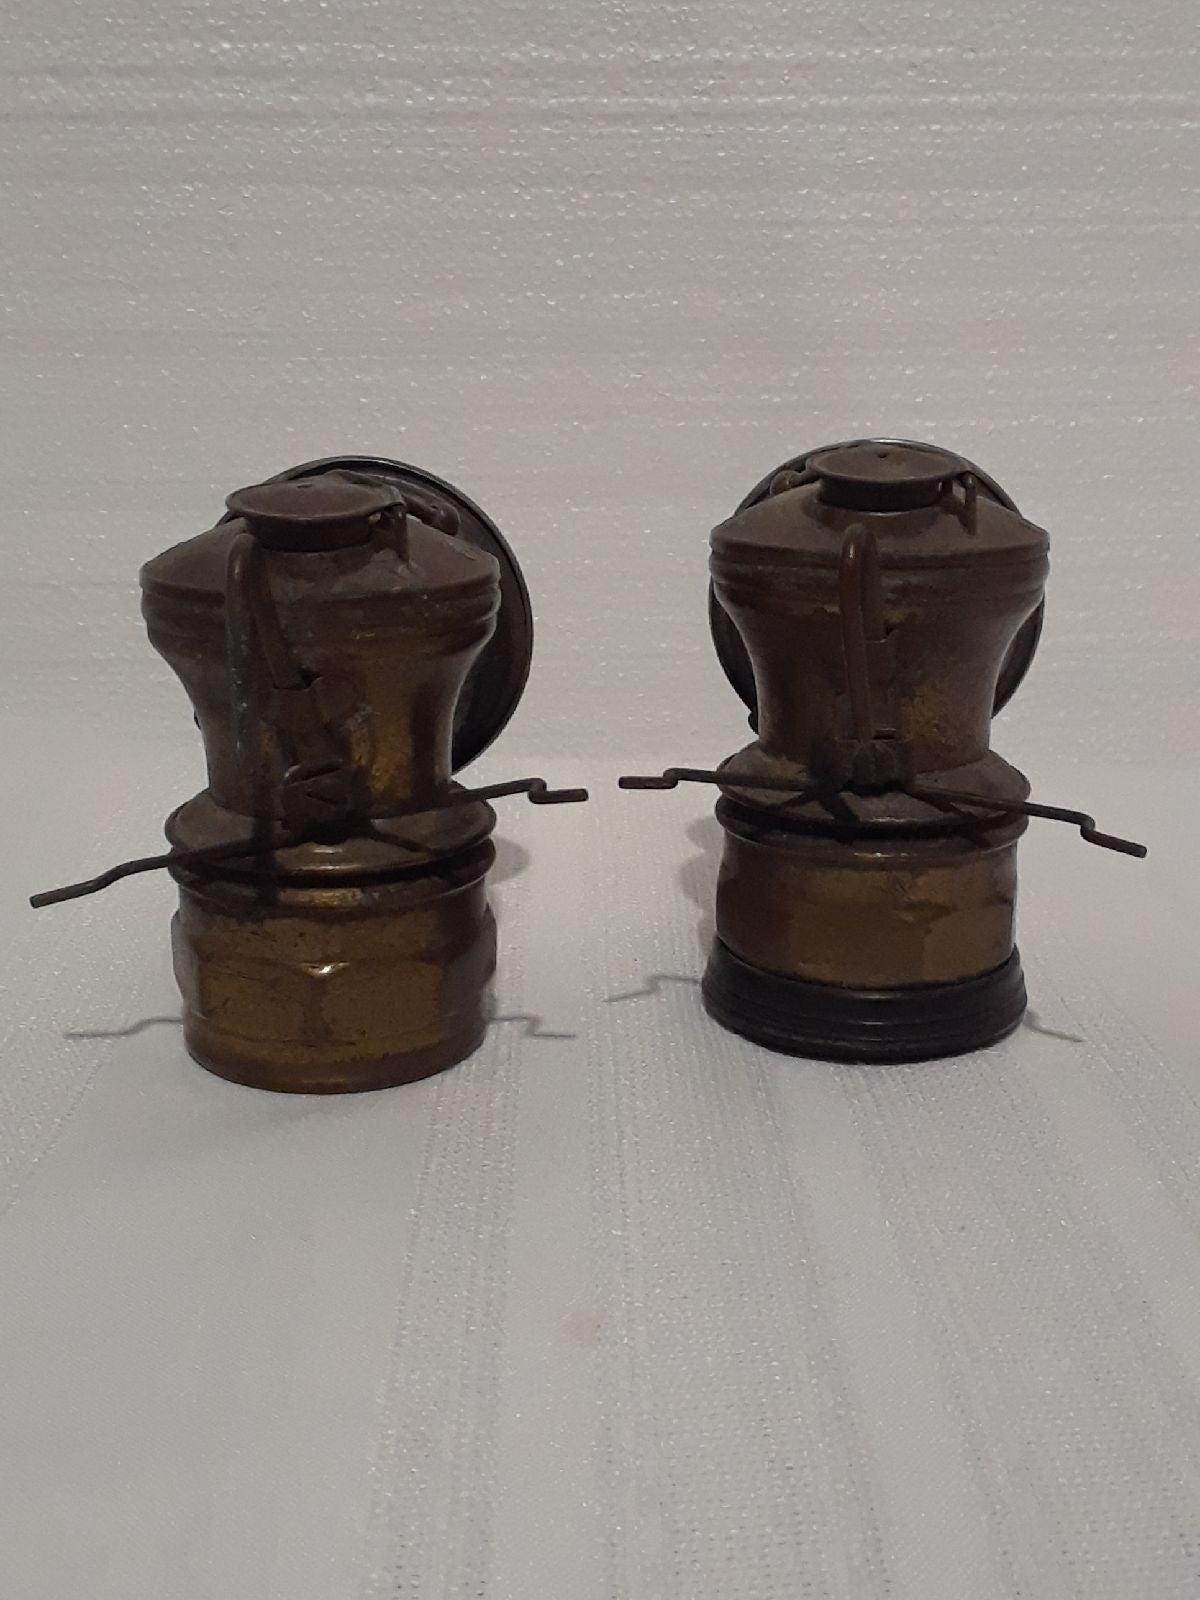 VTG brass Autolite carbide Miner's lamp